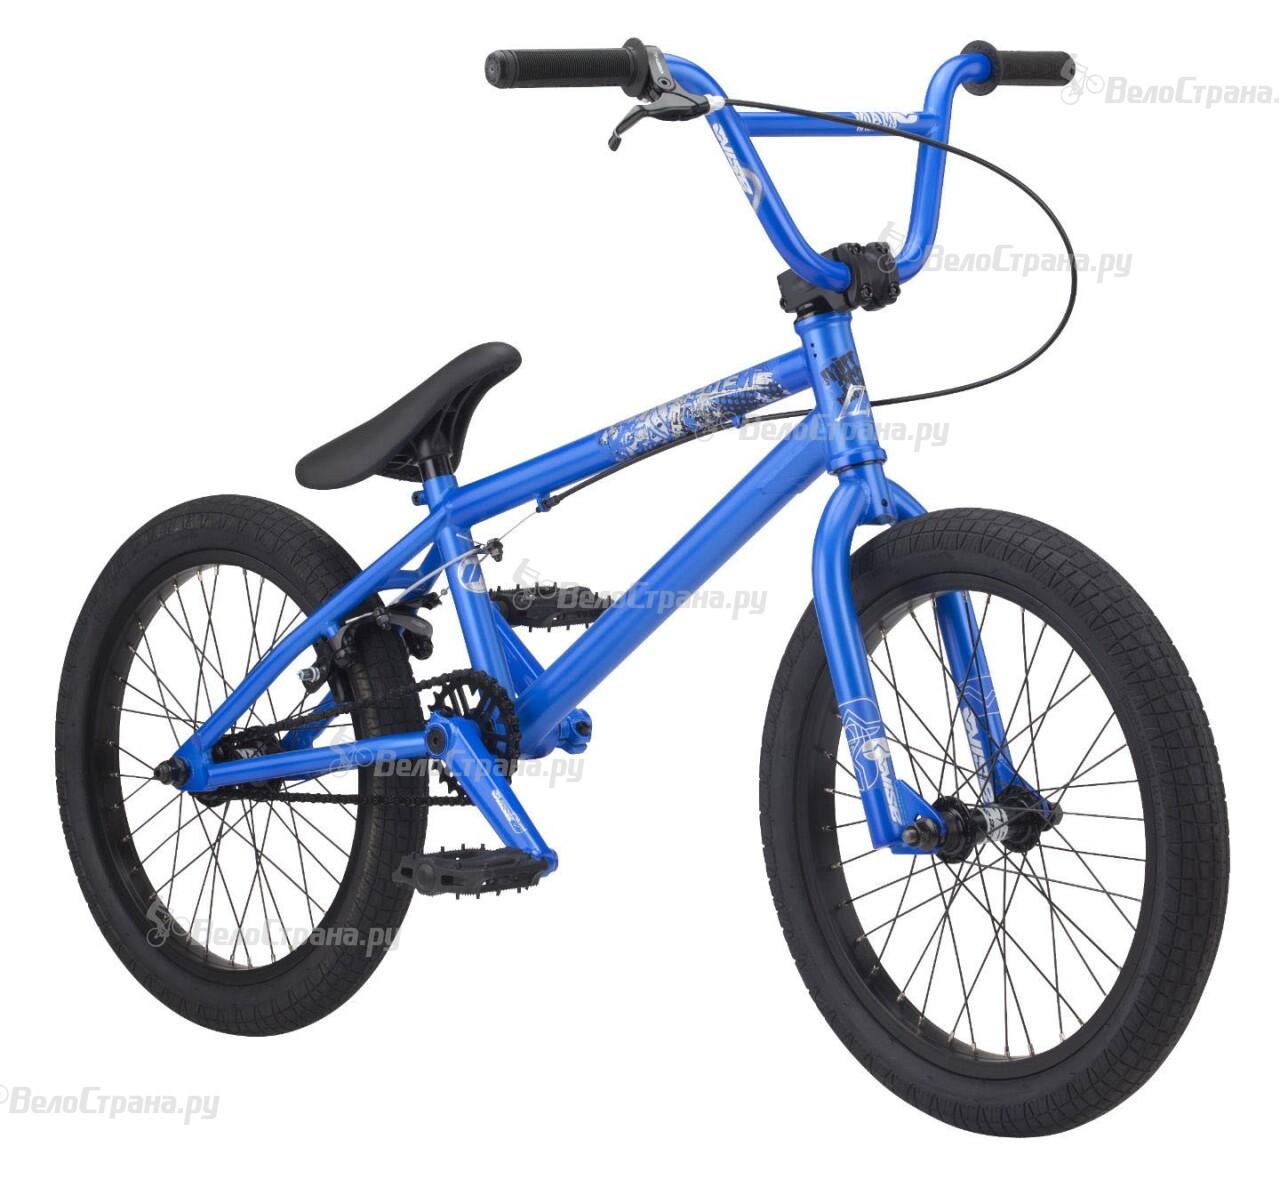 Велосипед Forward 2210 (2013) велосипед forward valencia 401 2013